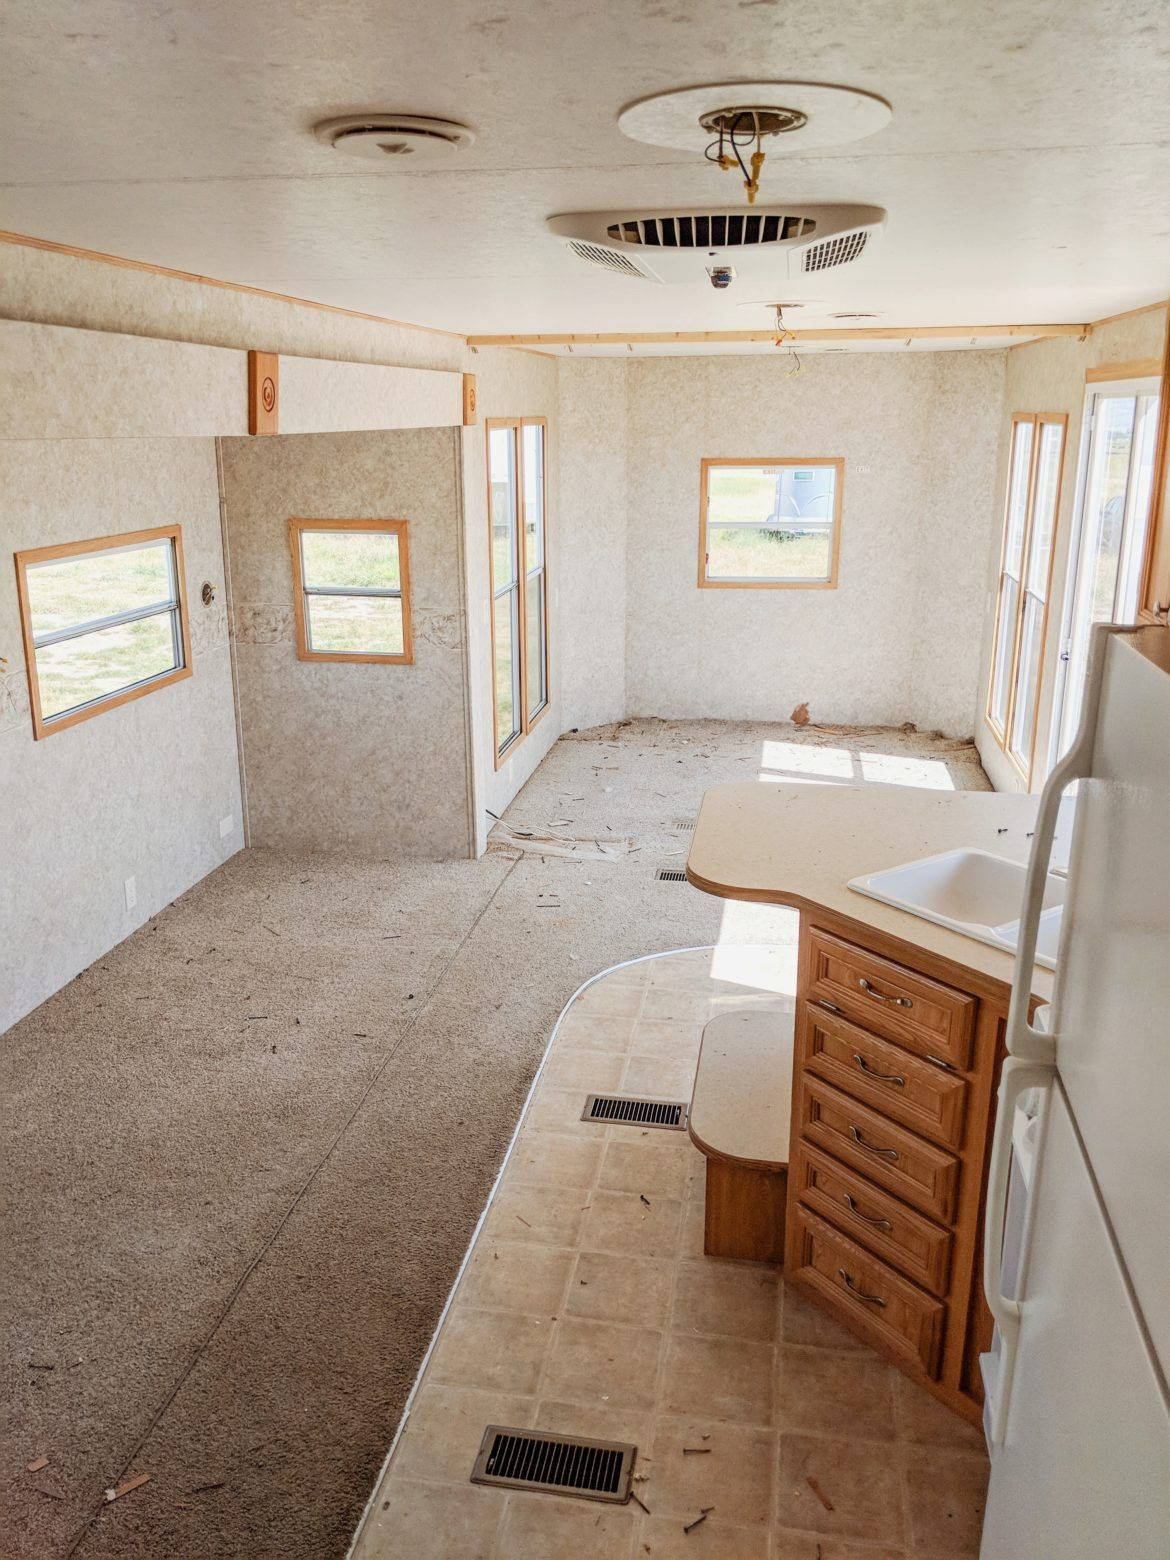 How to Paint RV Walls Paint rv, Rv remodel, Rv renovations